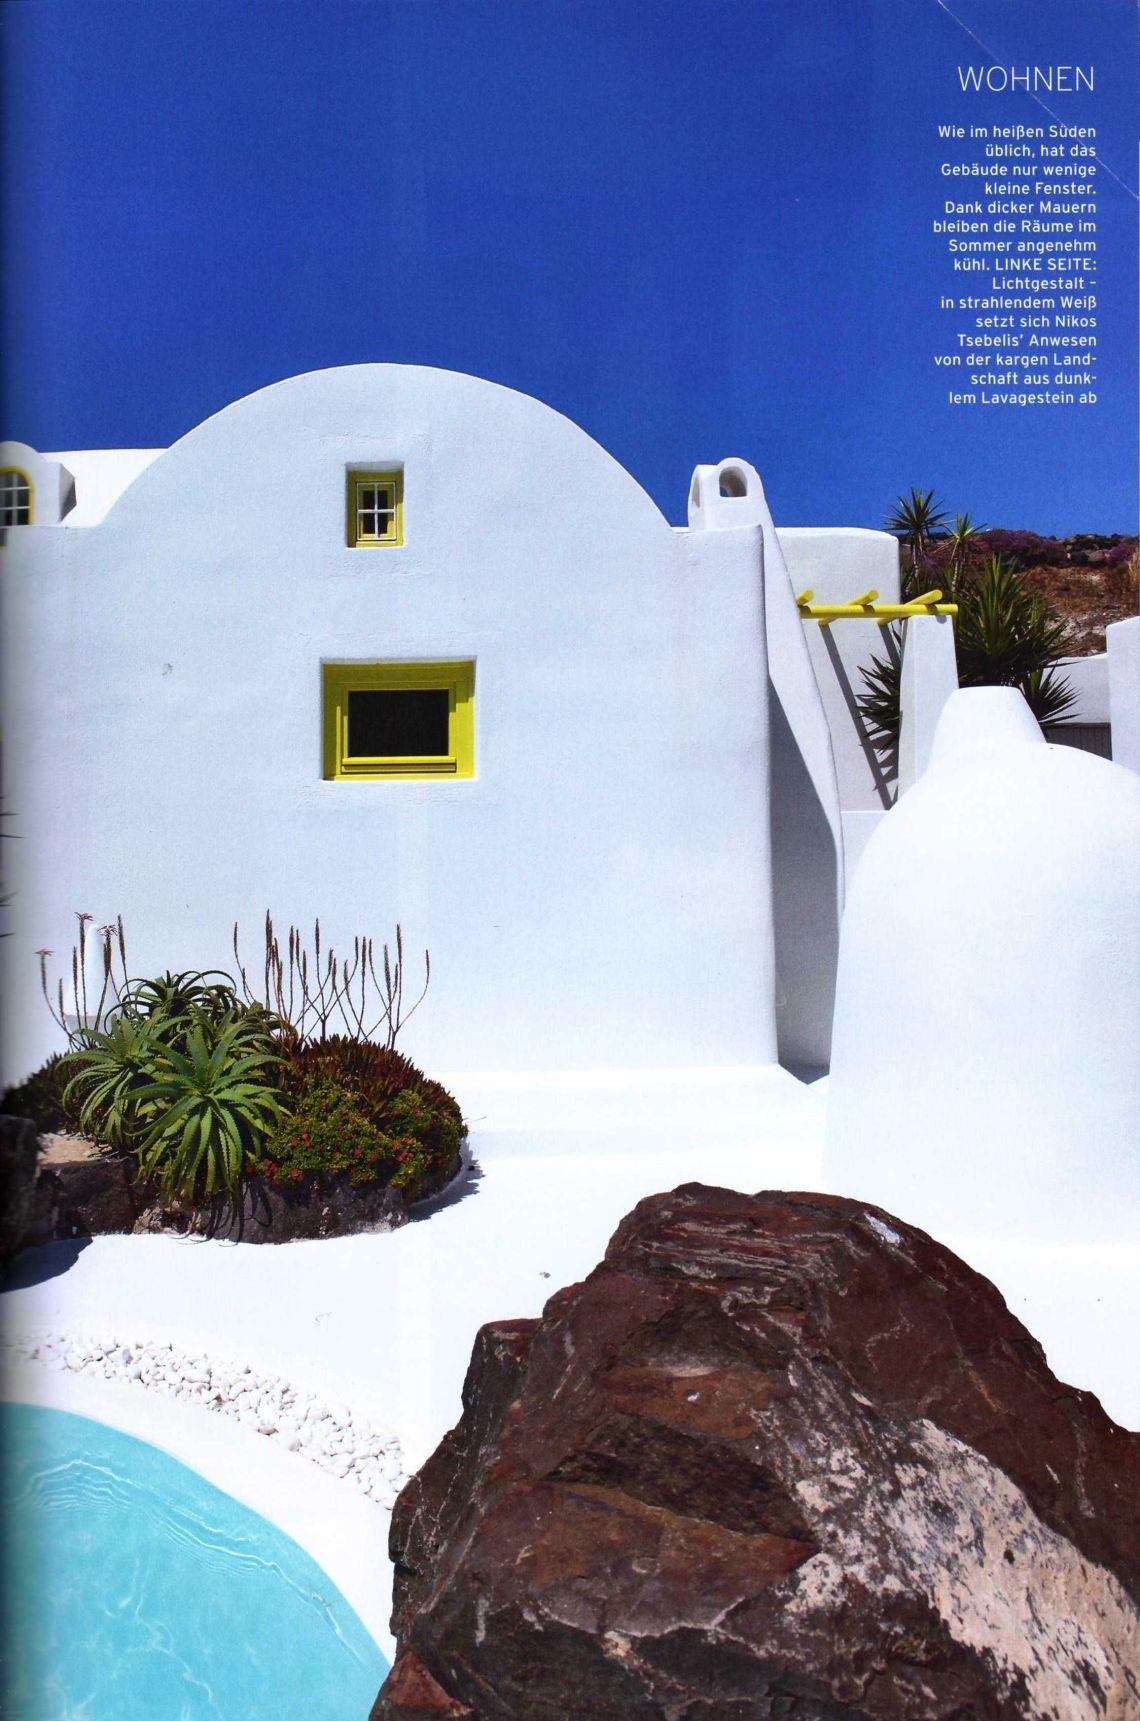 Adobe Greek Home - cfc243ab39a94173e1d5c441dab4c820_Top Adobe Greek Home - cfc243ab39a94173e1d5c441dab4c820  Snapshot_93737.jpg